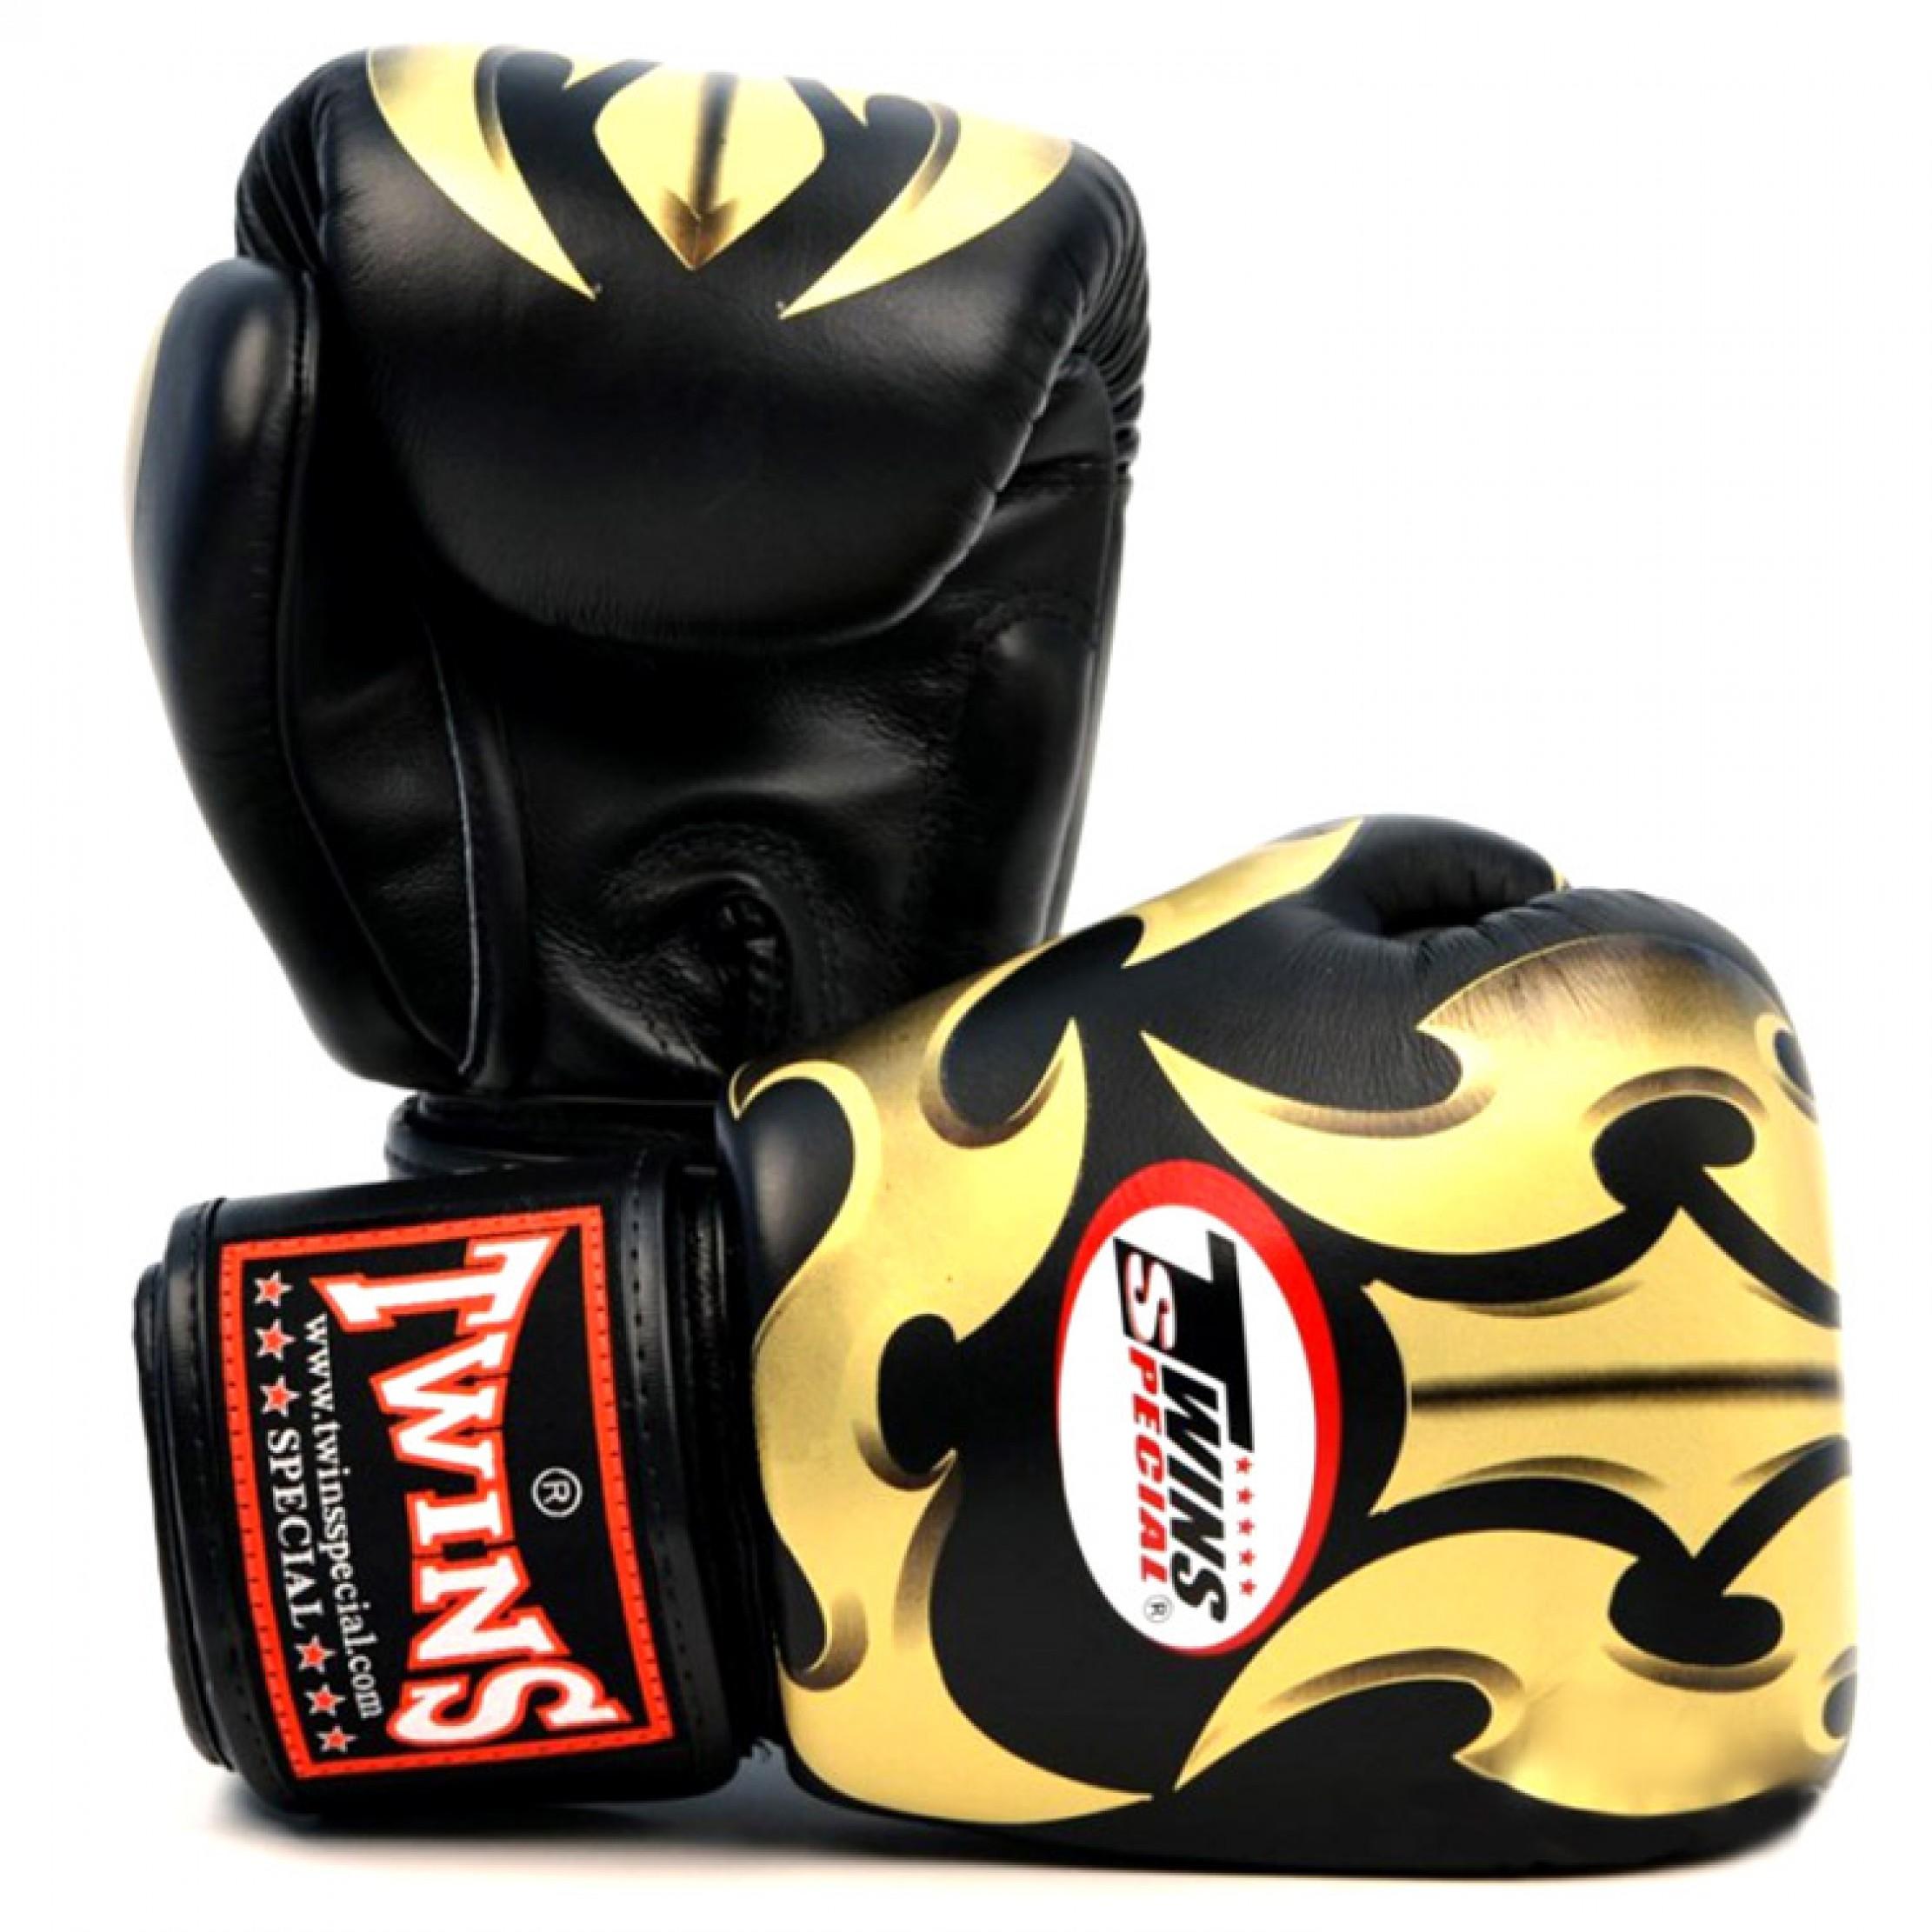 Купить Перчатки для бокса Twins Special FBGV-22G (Black), 3266_bk_gd